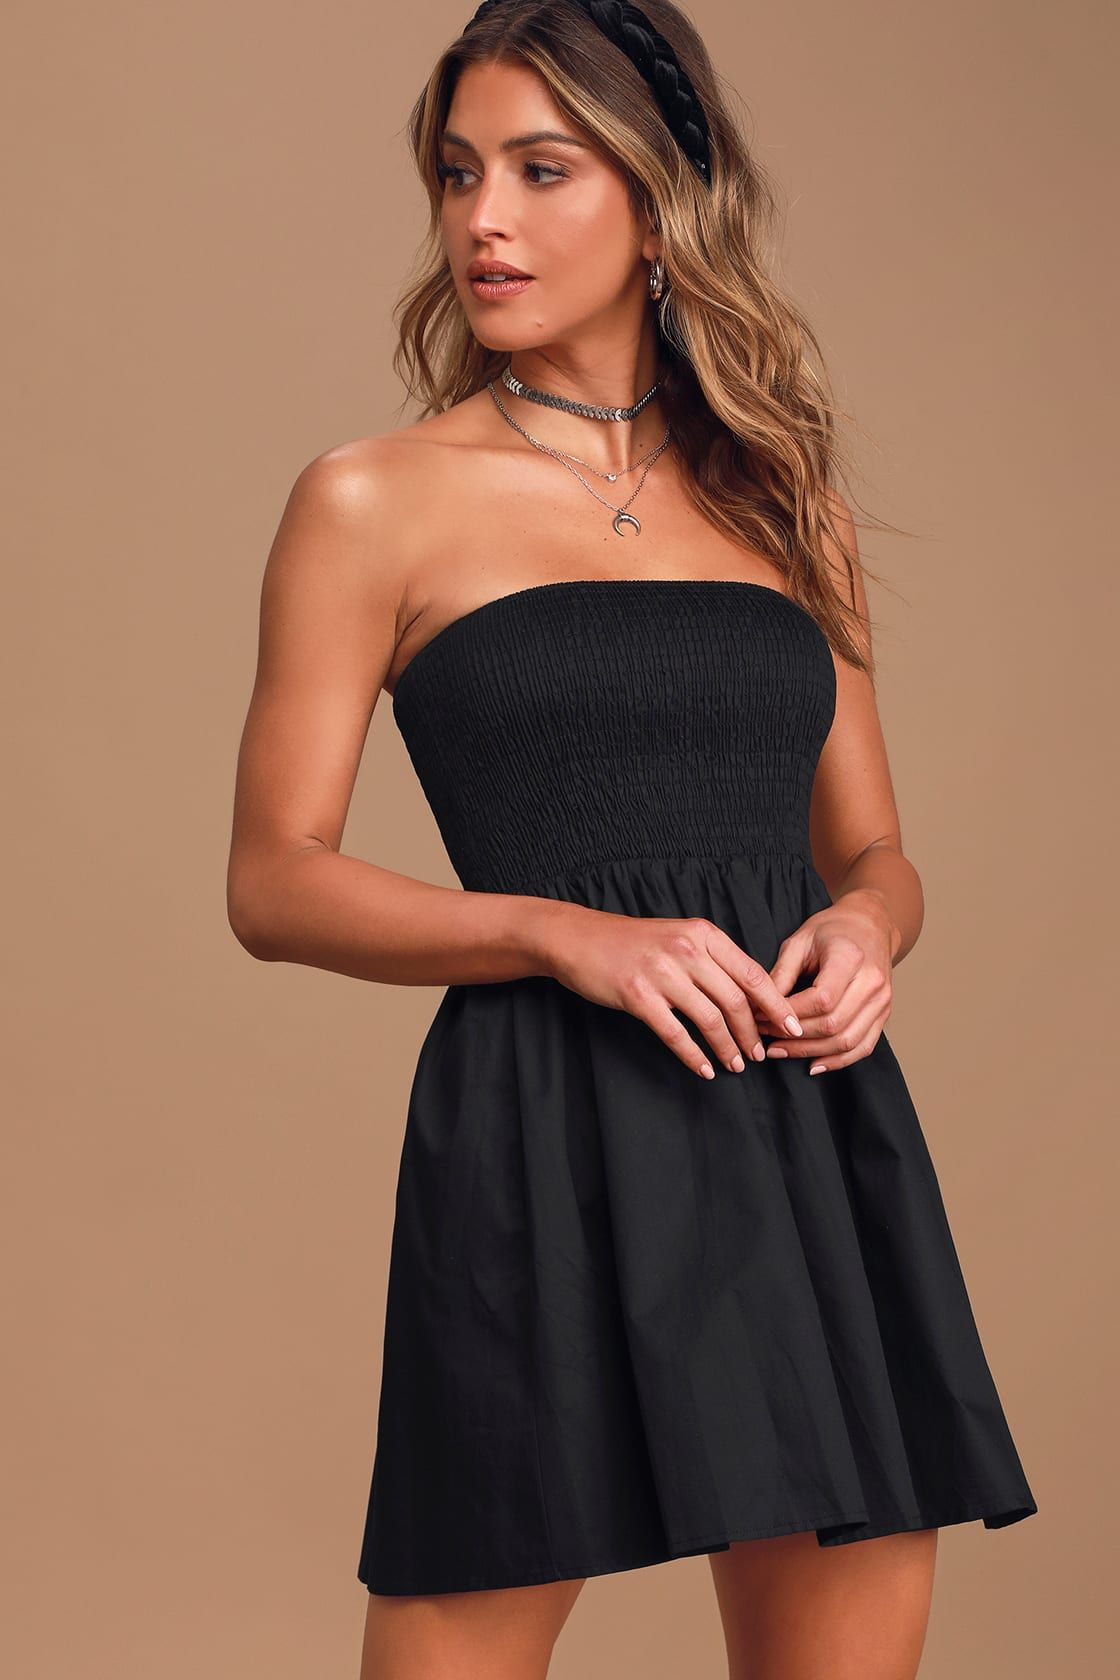 Our Love Story Black Strapless Smocked Mini Skater Dress Strapless Dresses Short Mini Skater Dress Casual Summer Dresses Sundresses [ 1680 x 1120 Pixel ]